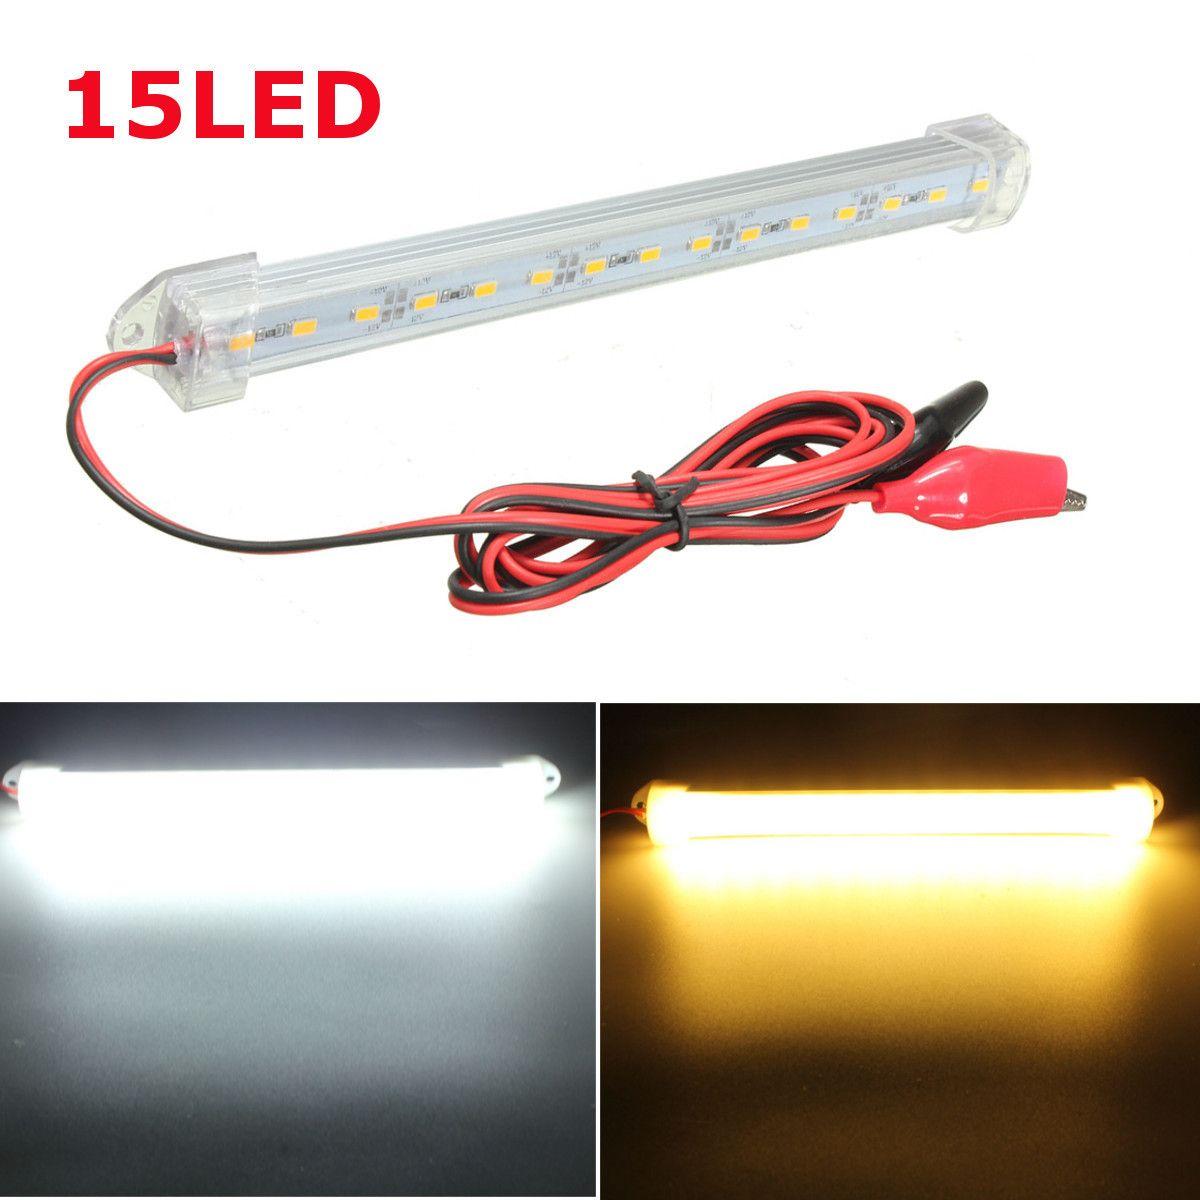 2 68 Buy Here Https Alitems Com G 1e8d114494ebda23ff8b16525dc3e8 I 5 Ulp Https 3a 2f 2fwww Aliexpress Com 2fi Strip Lighting Led Strip Lighting Led Strip